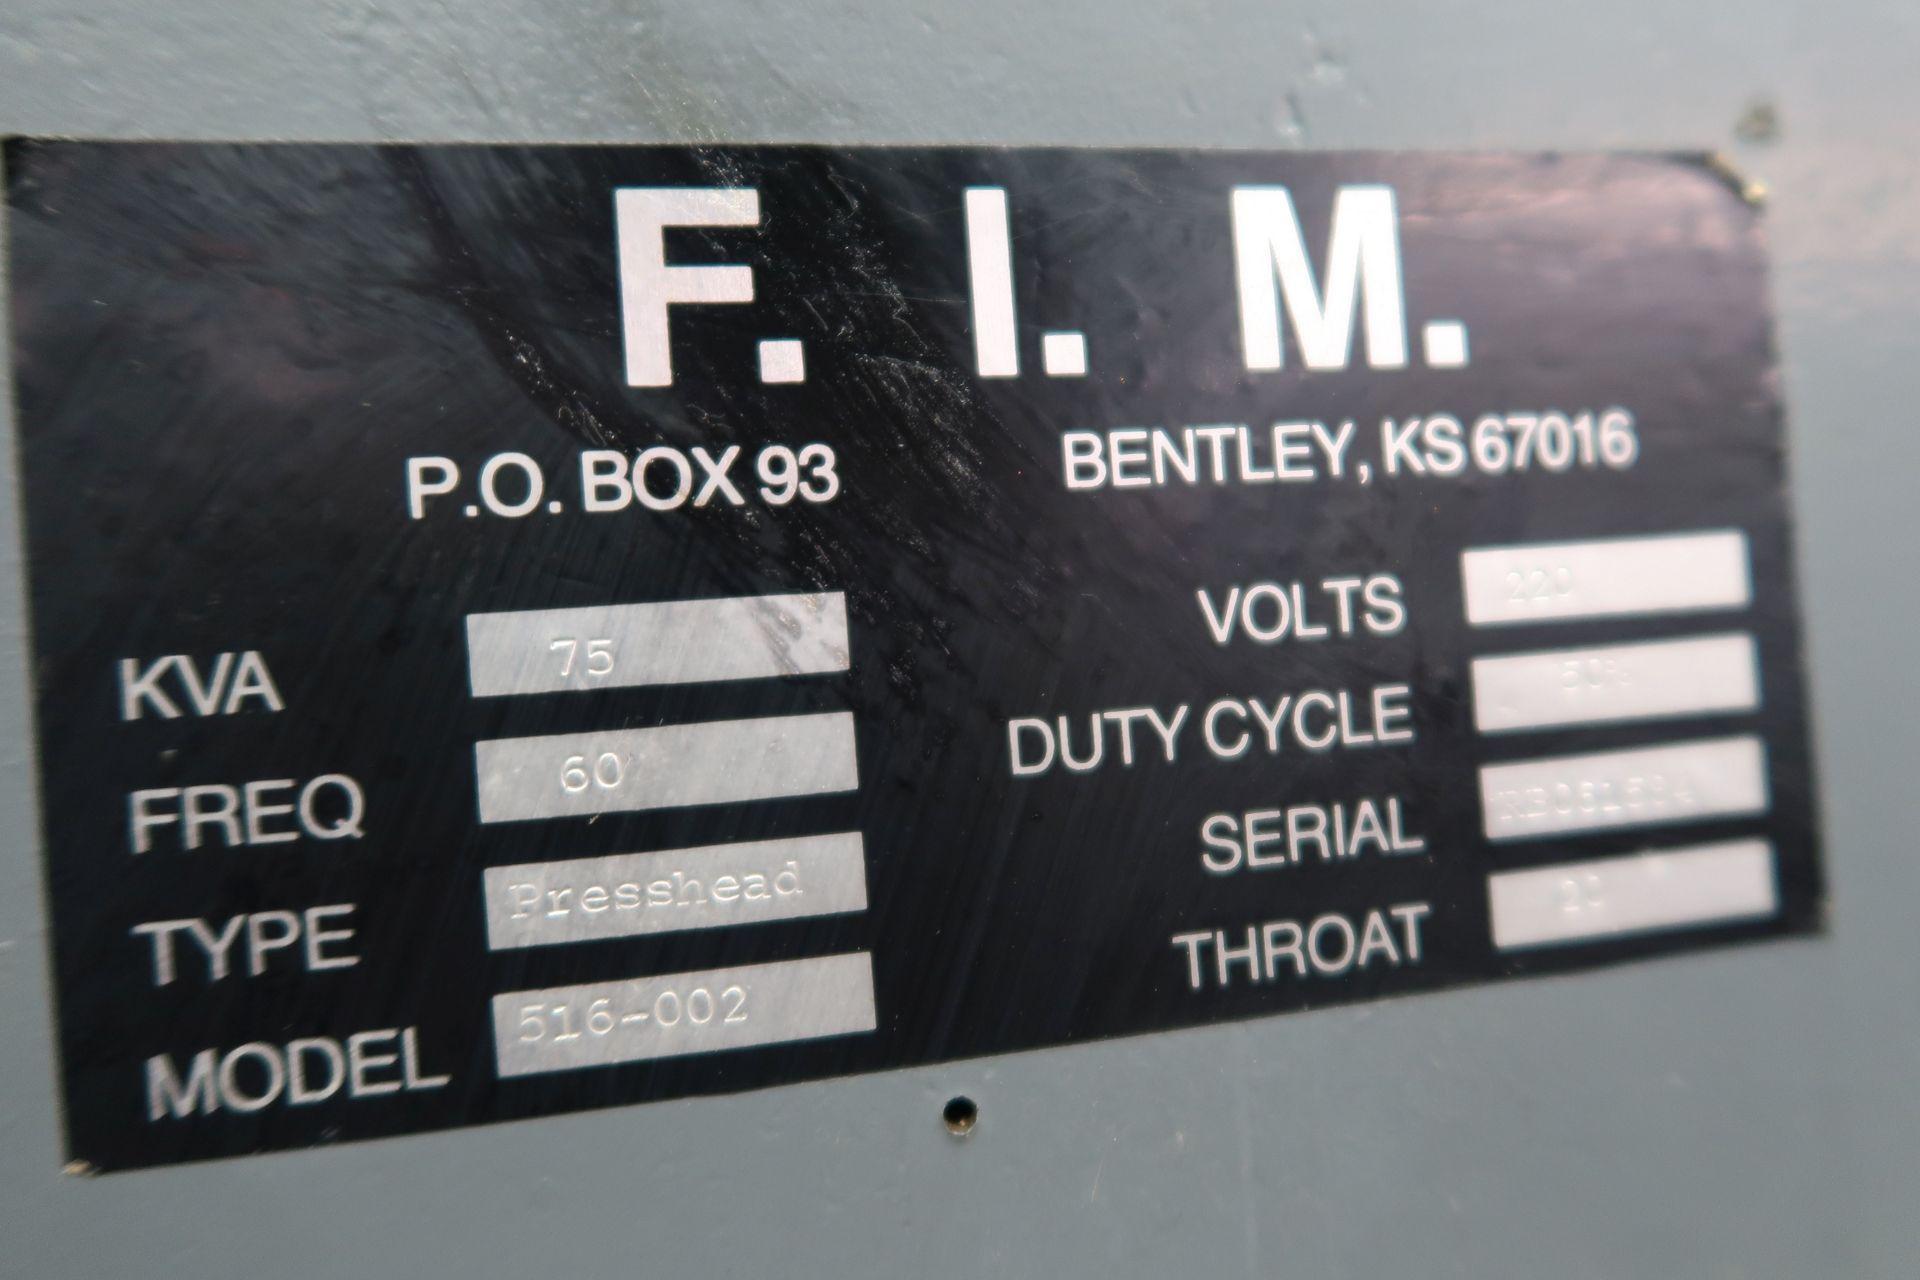 "75 KVA FIM MODEL 516-002 PRESSHEAD TYPE SPOT WELDER; S/N RB061584, 20"" THROAT, 220 VOLTS - Image 7 of 8"